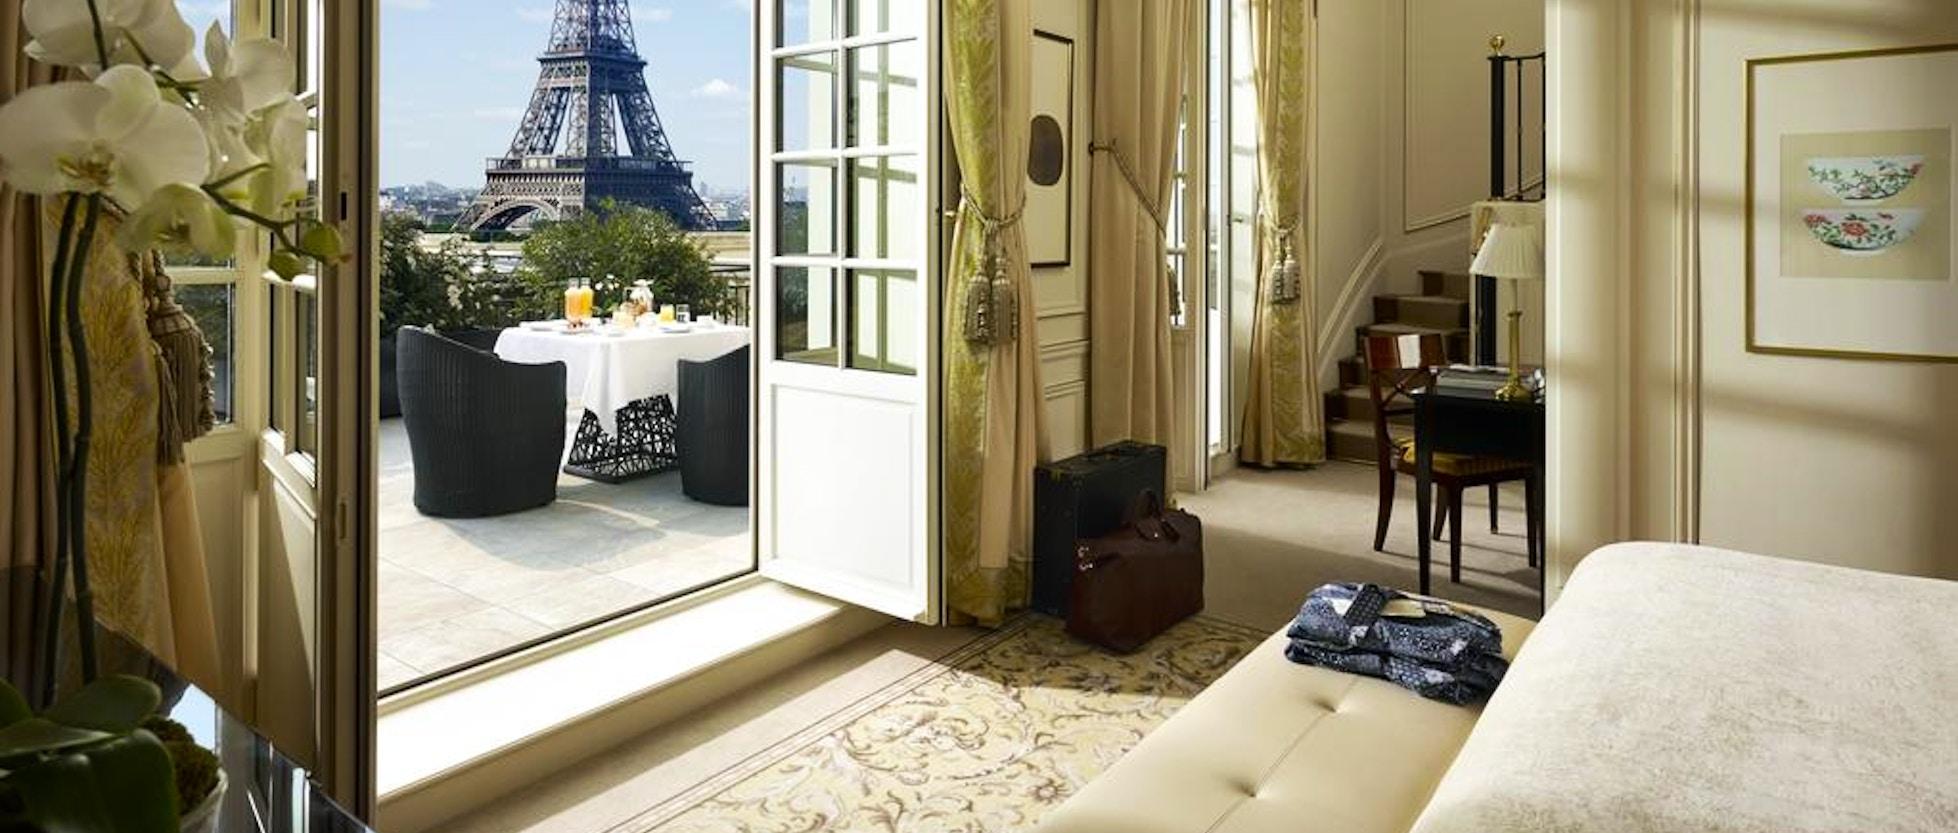 9 hotel ideali per un romantico weekend a parigi   vivi parigi - Soggiorno Romantico Particolare 2